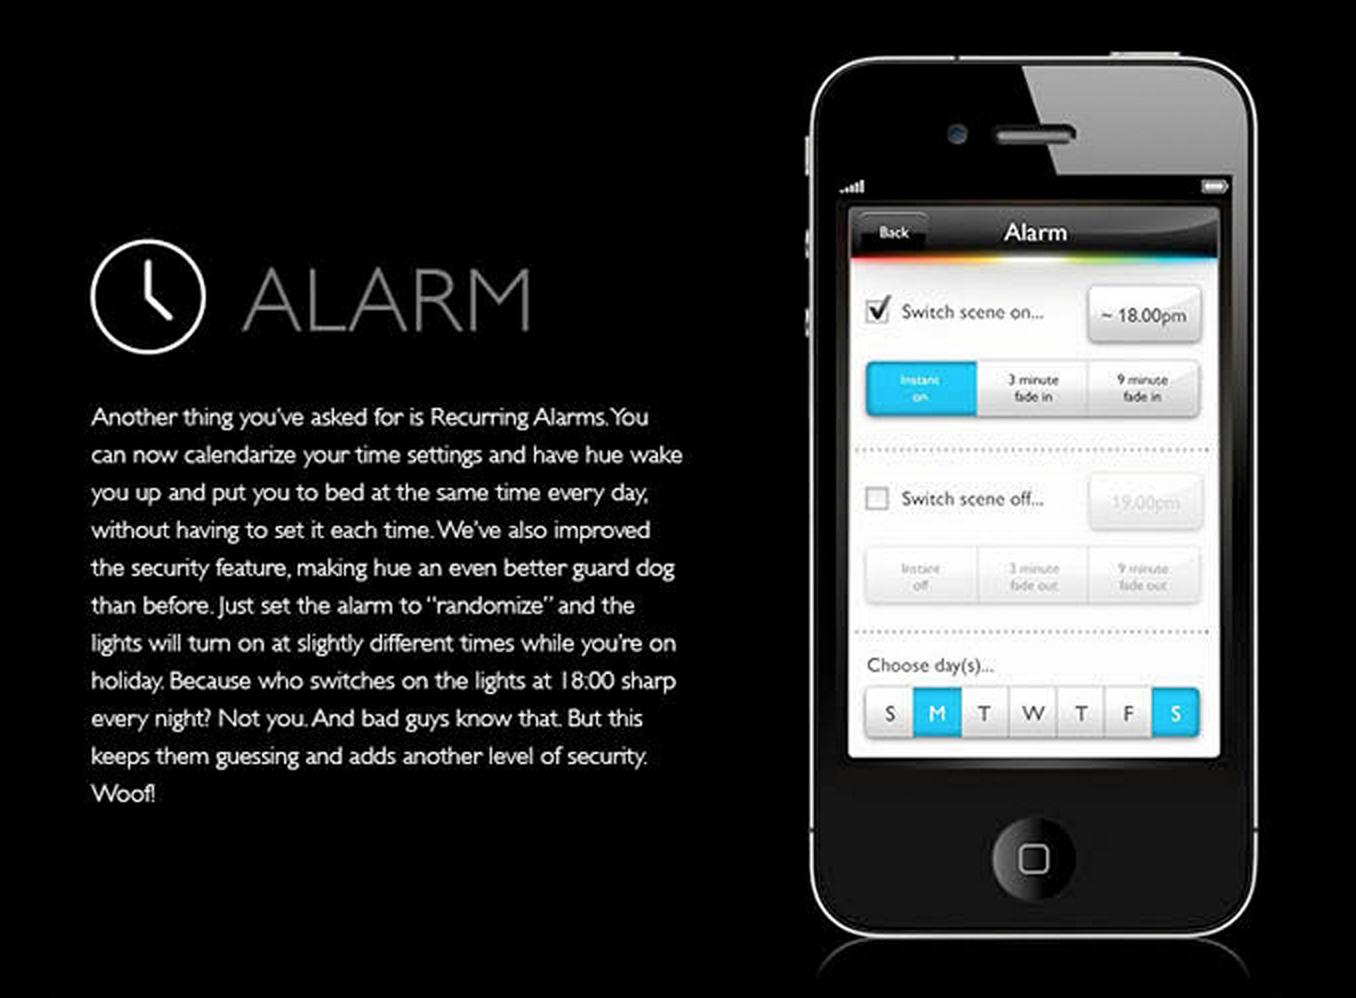 philips hue app update 02 9to5mac. Black Bedroom Furniture Sets. Home Design Ideas